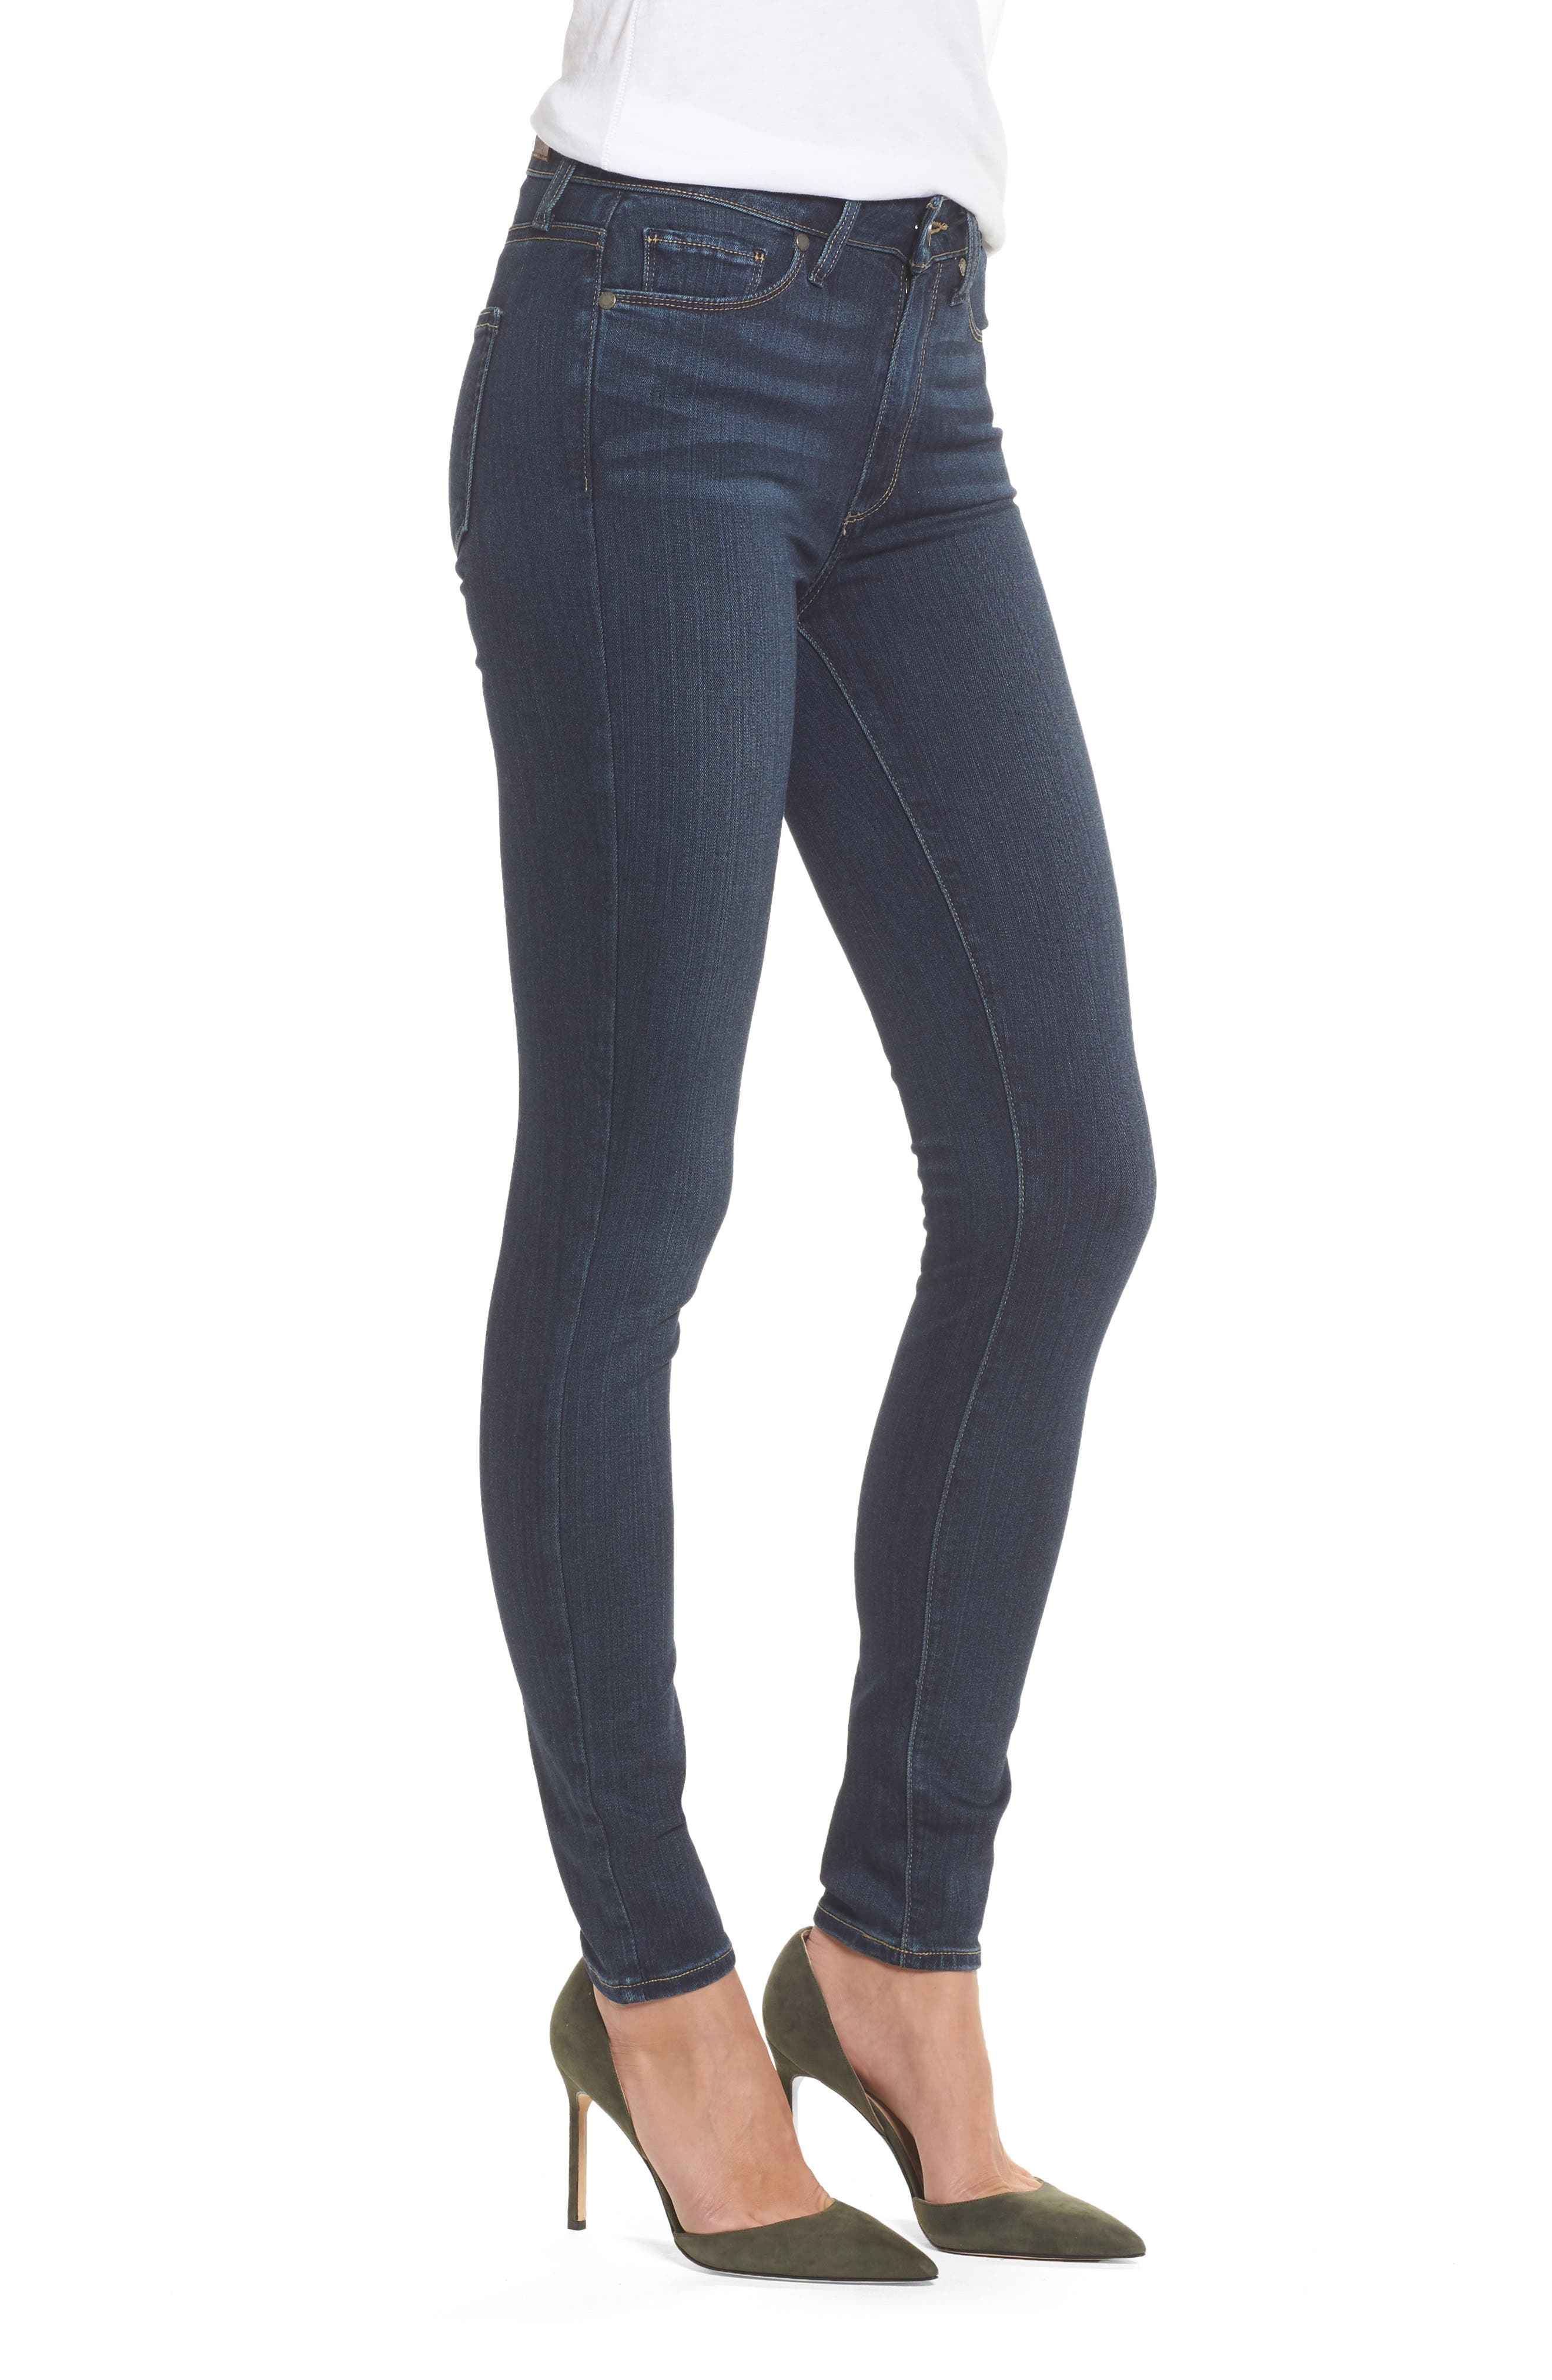 Transcend - Hoxton High Waist Ultra Skinny Jeans,                             Alternate thumbnail 4, color,                             Nottingham